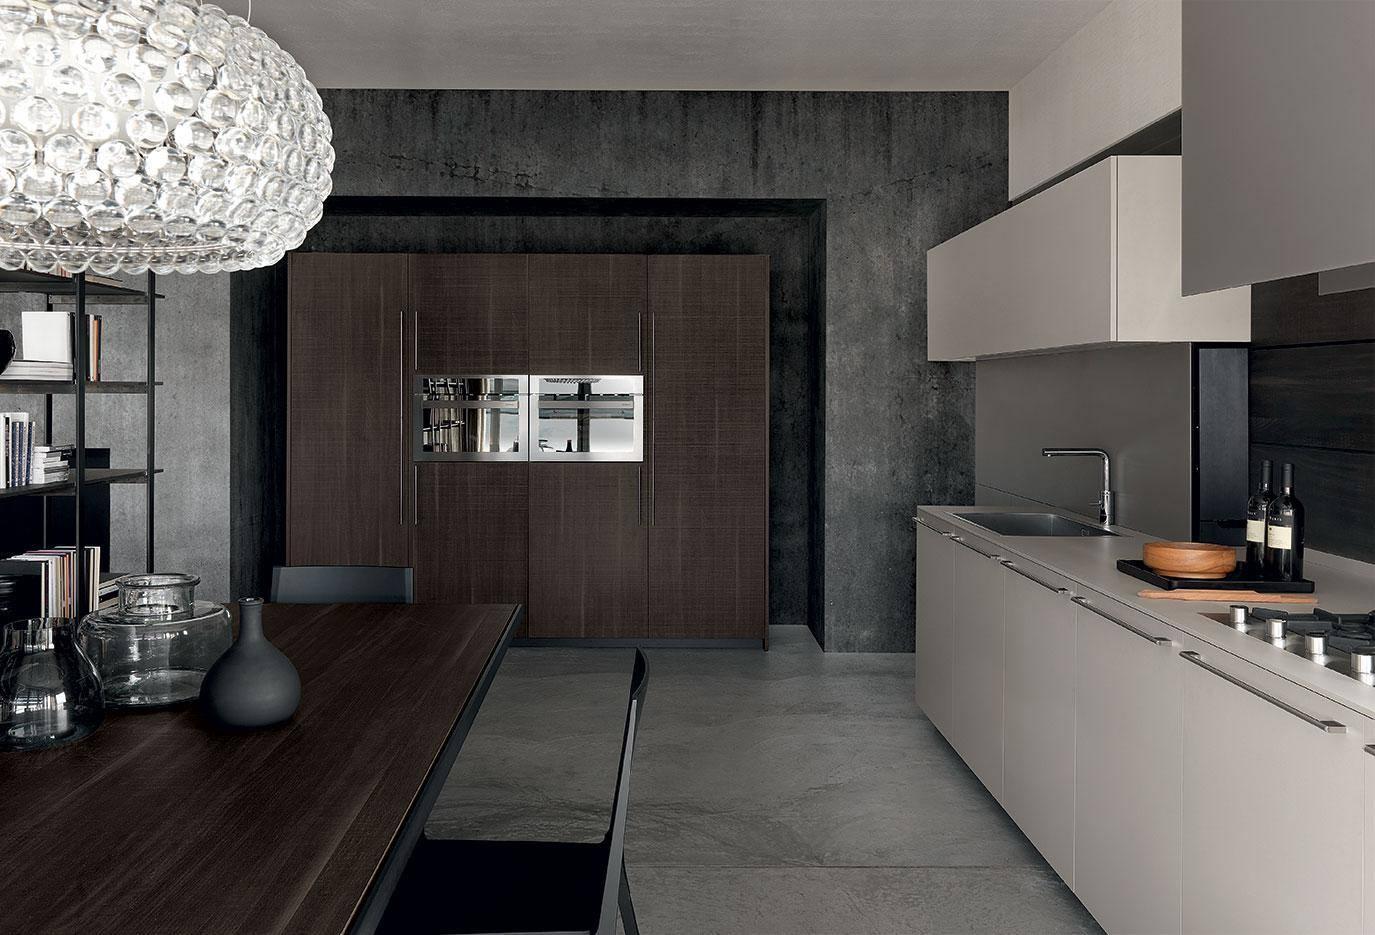 Novit cucine modulnova ballarini interni ballarini for Cucine 2017 moderne